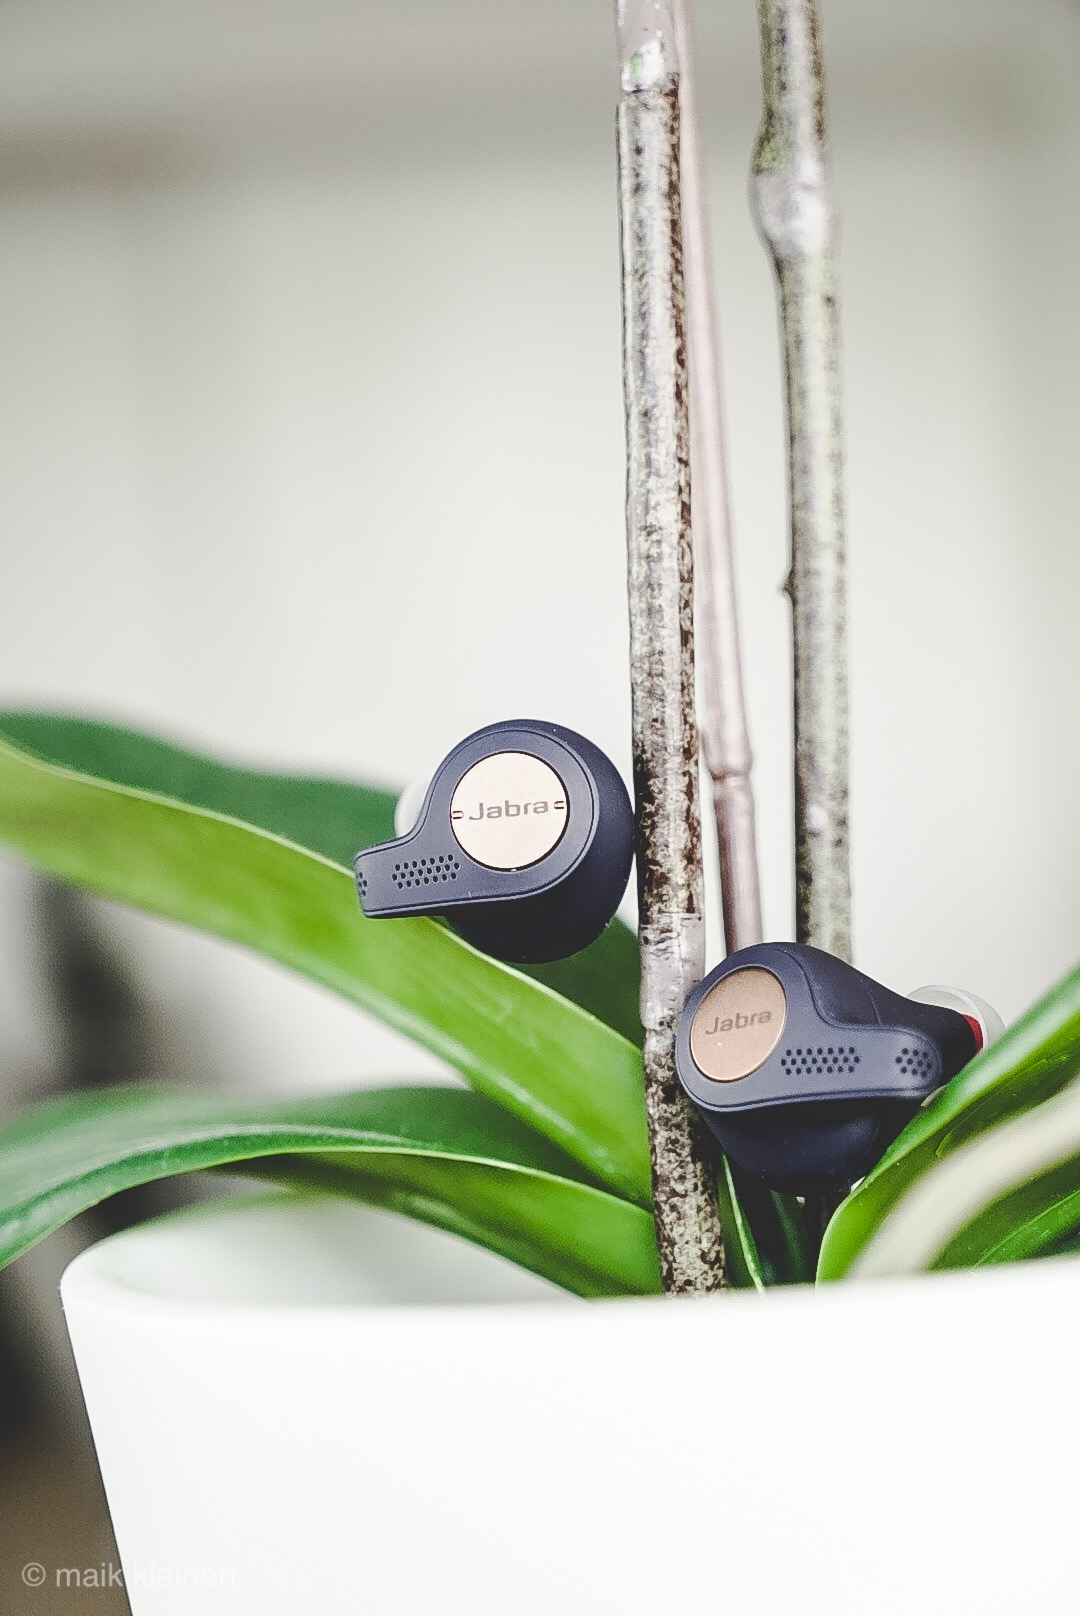 jabra elite active 65t wireless in ears_2.JPG